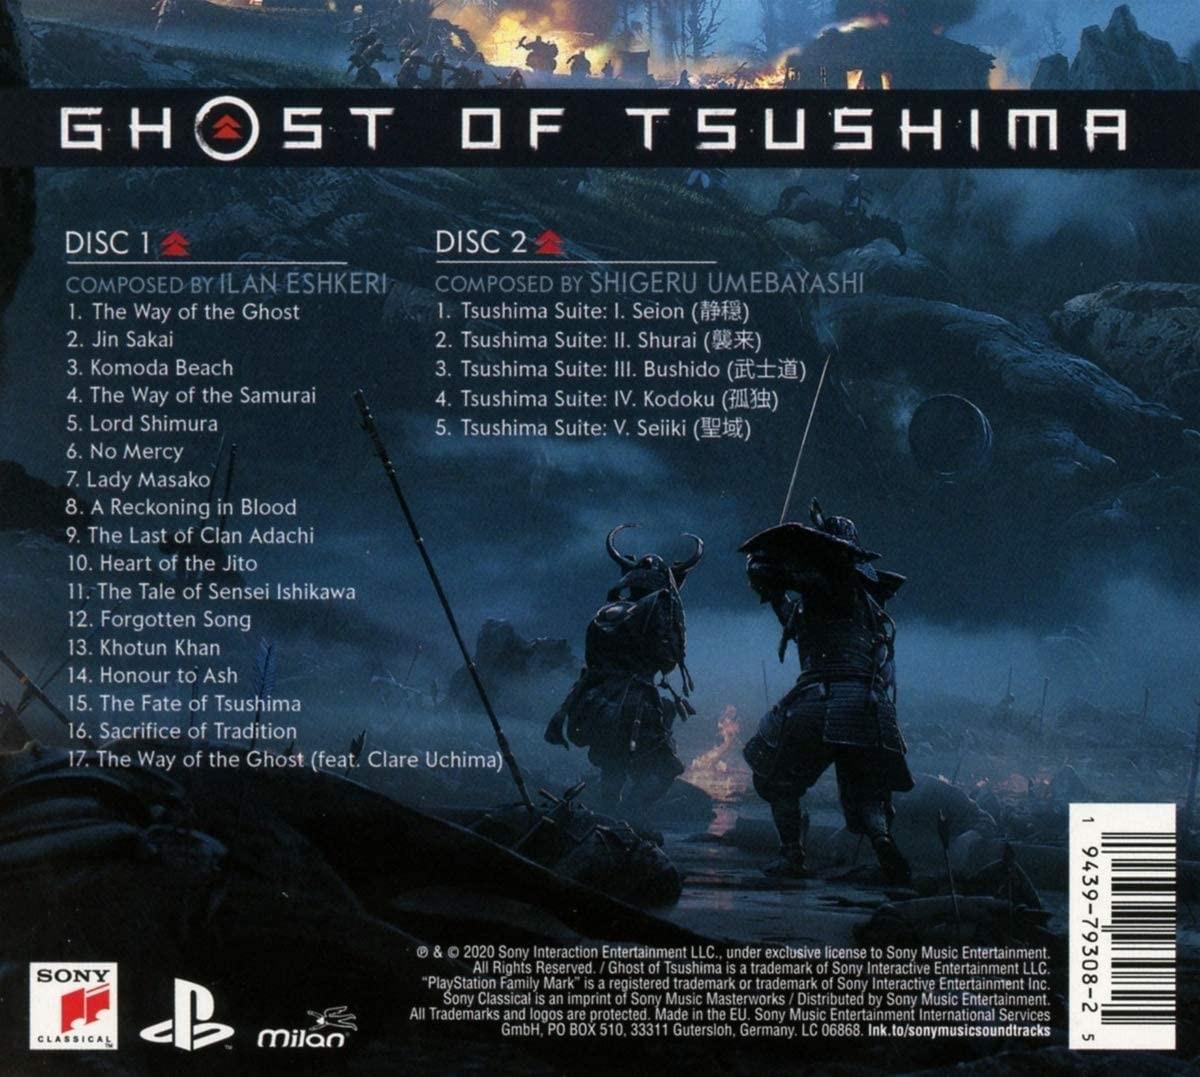 Ghost of Tsushima - okładka soundtracku CD (tył)